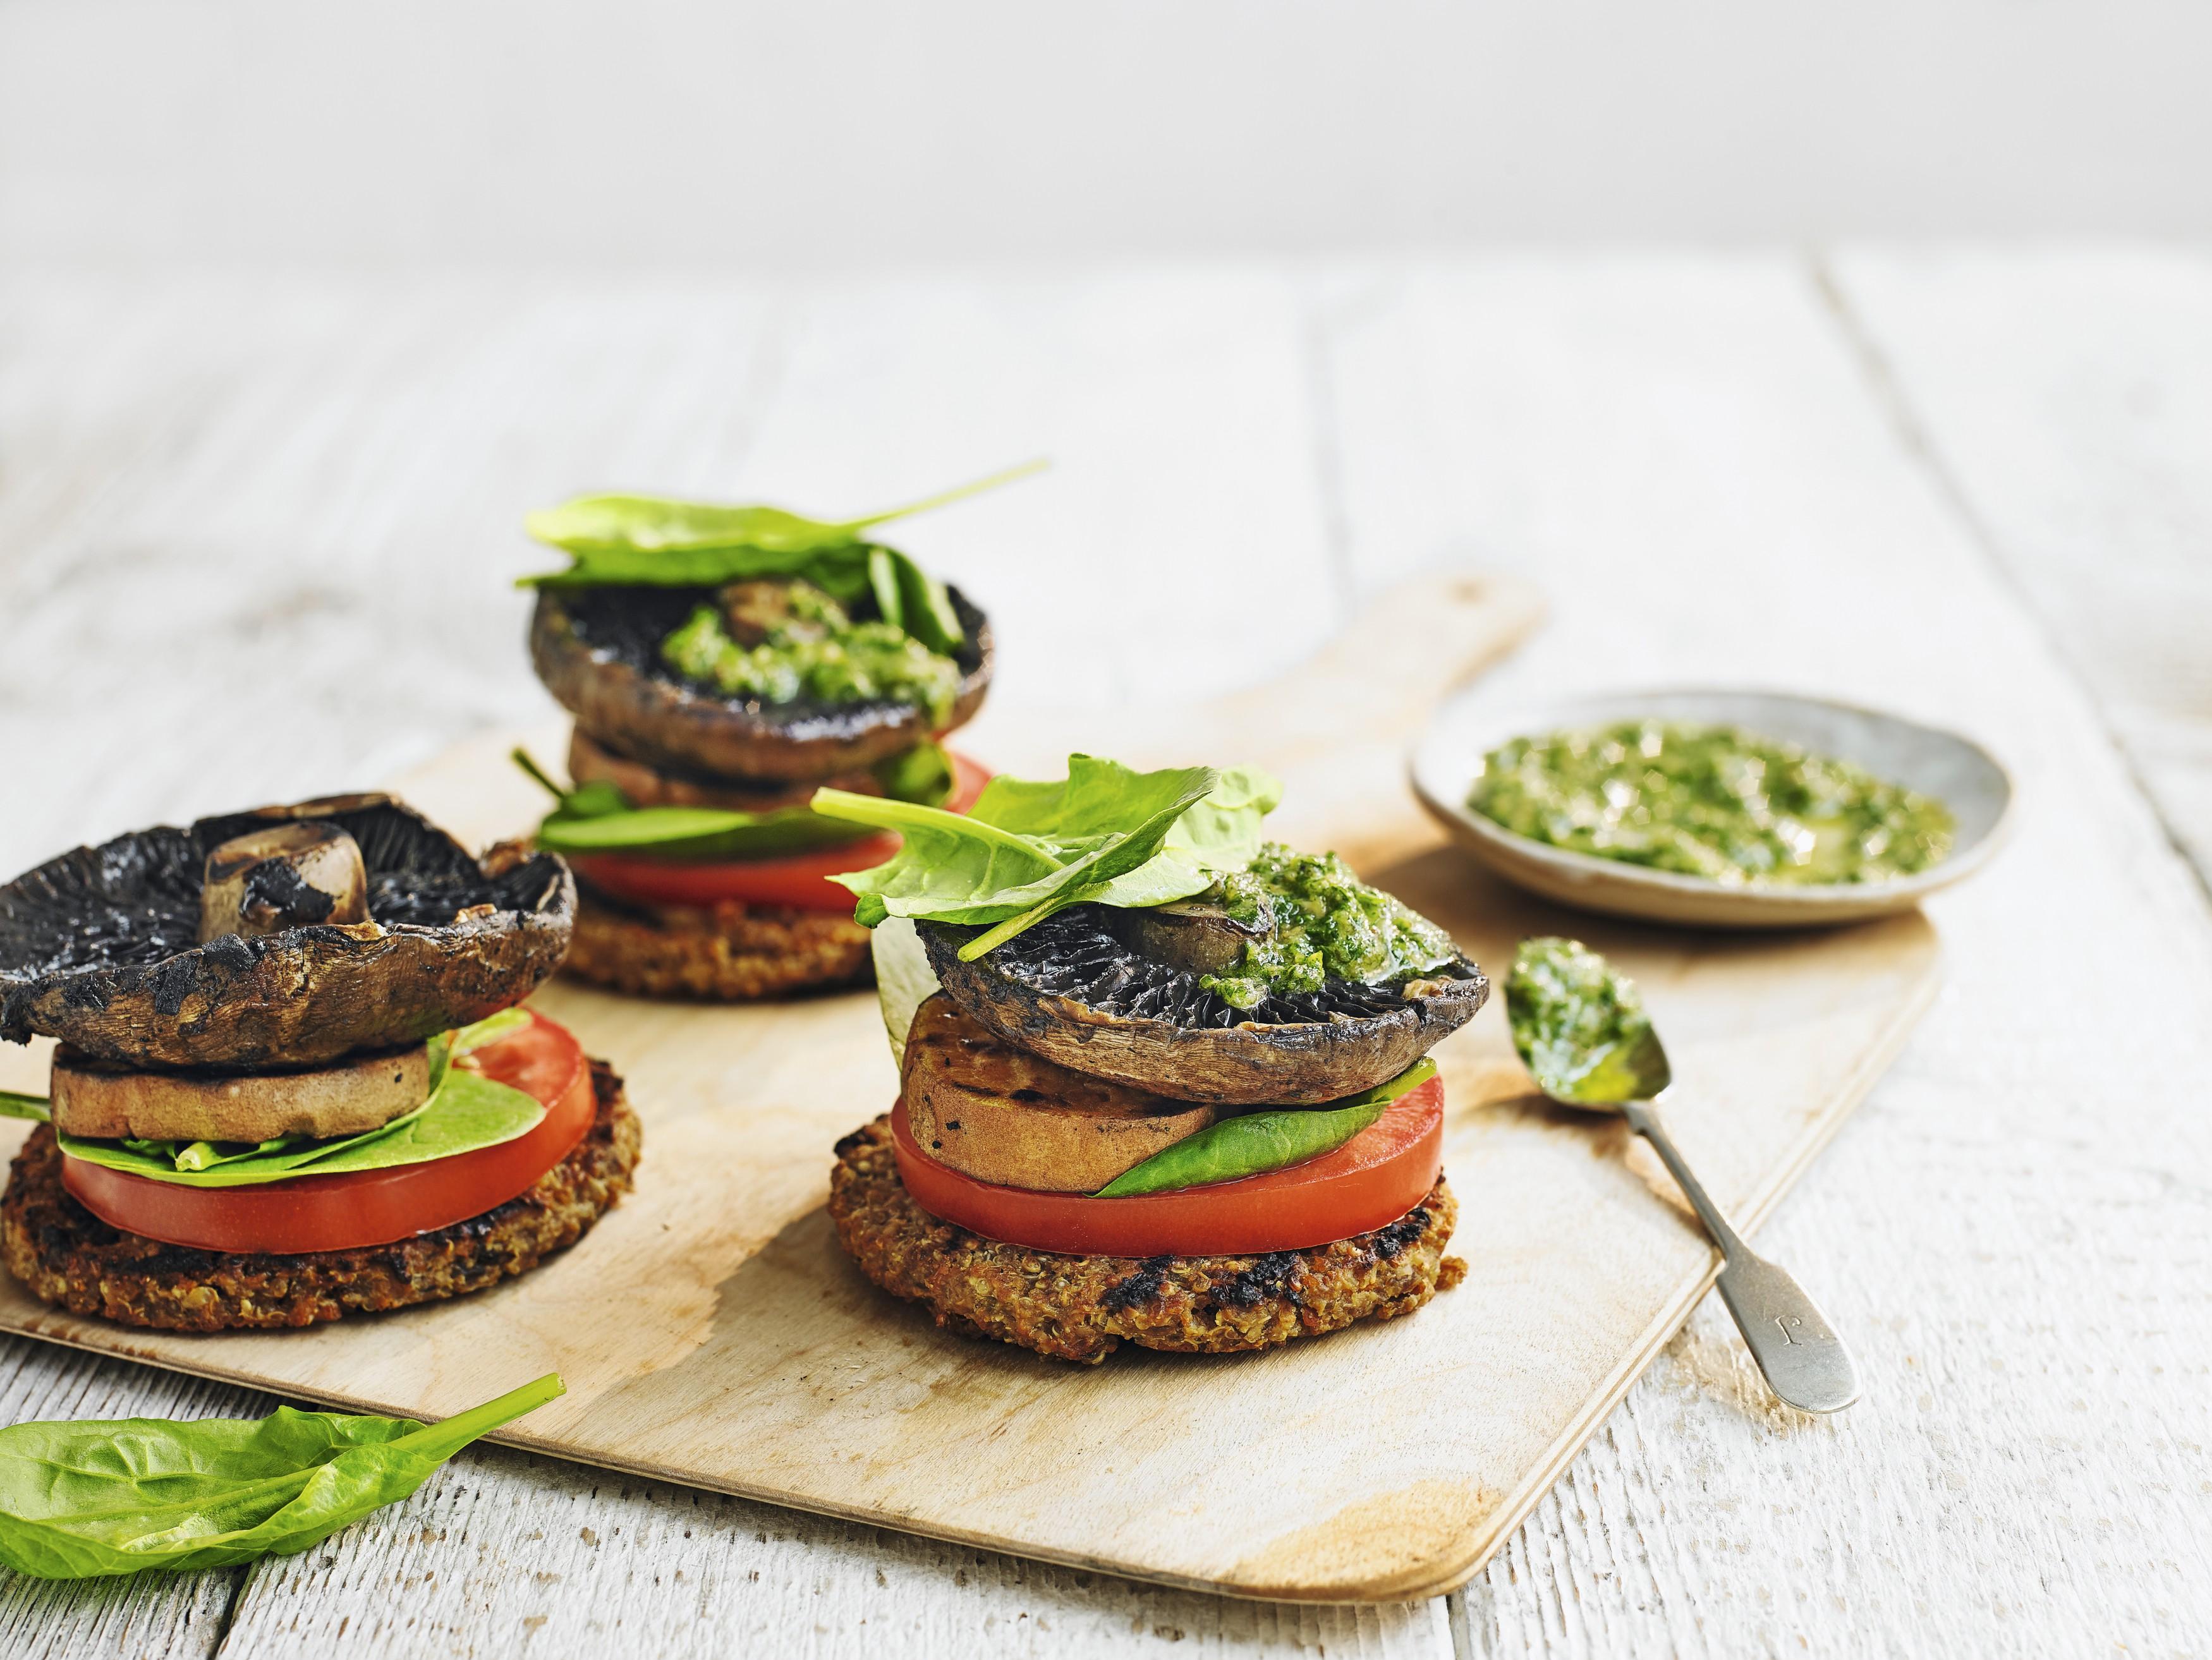 Veggie Burger Stacks with Parsley Pesto